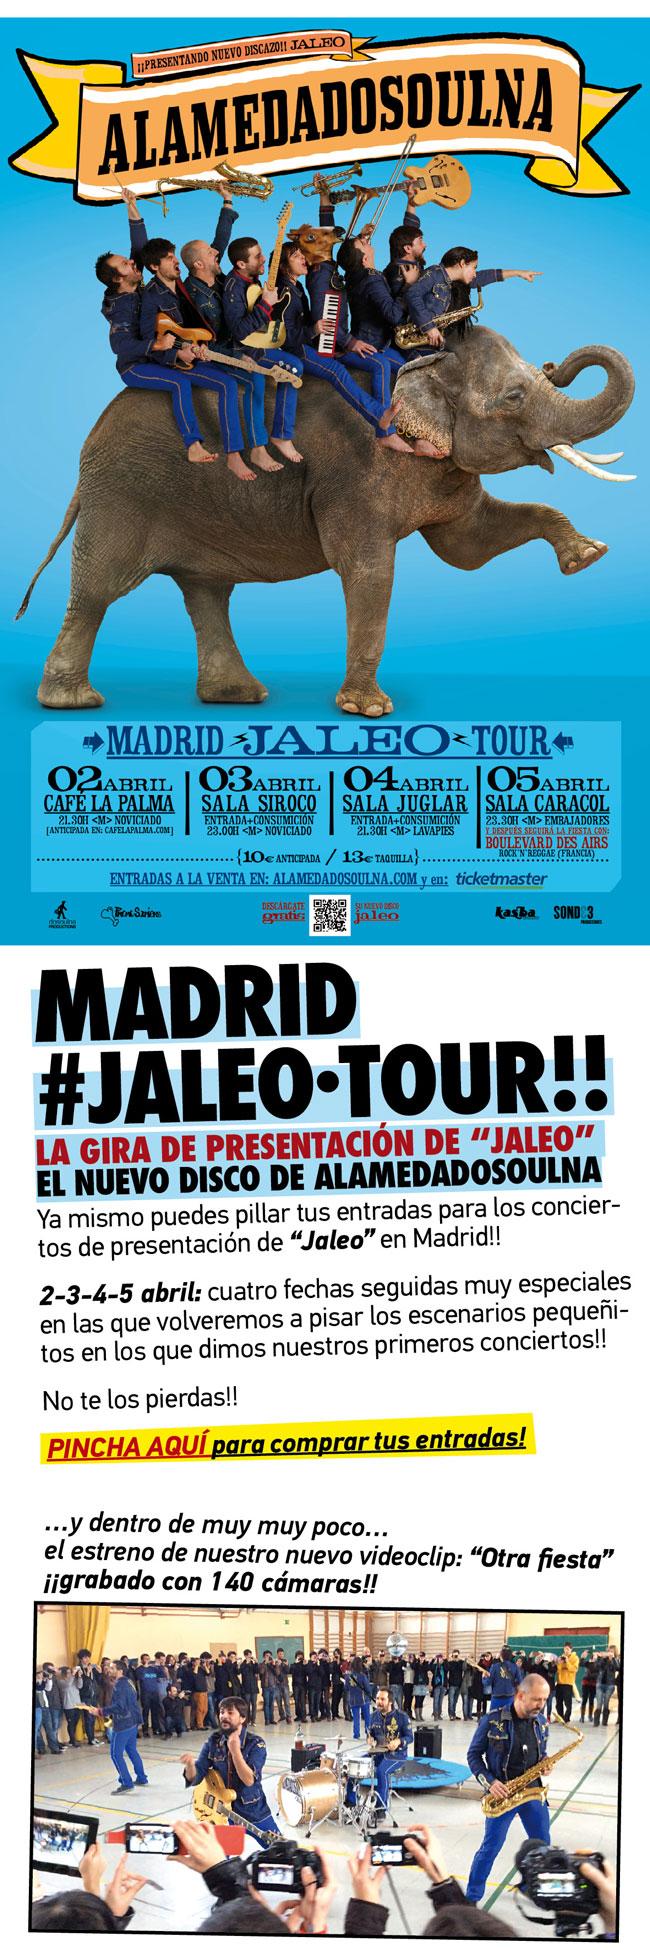 alamedadeosoulna-madrid-jaleo-tour